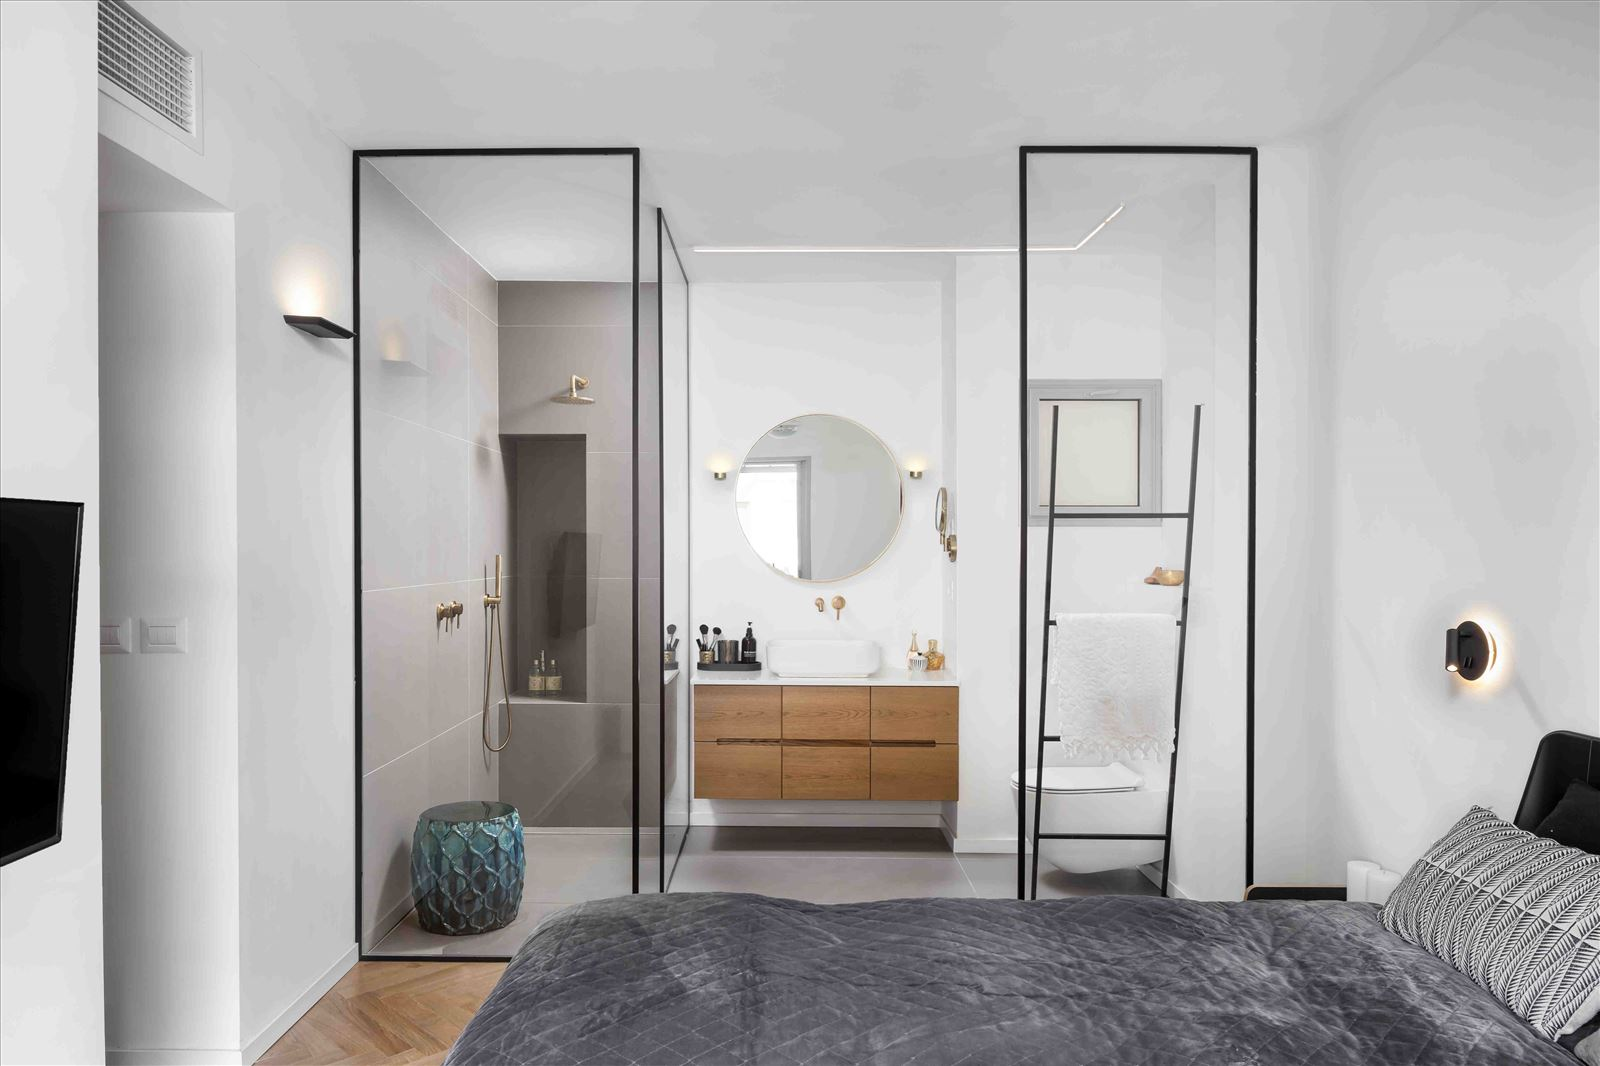 Apartment in North Tel Aviv התאורה בחדר נעשתה על ידי דורי קמחי